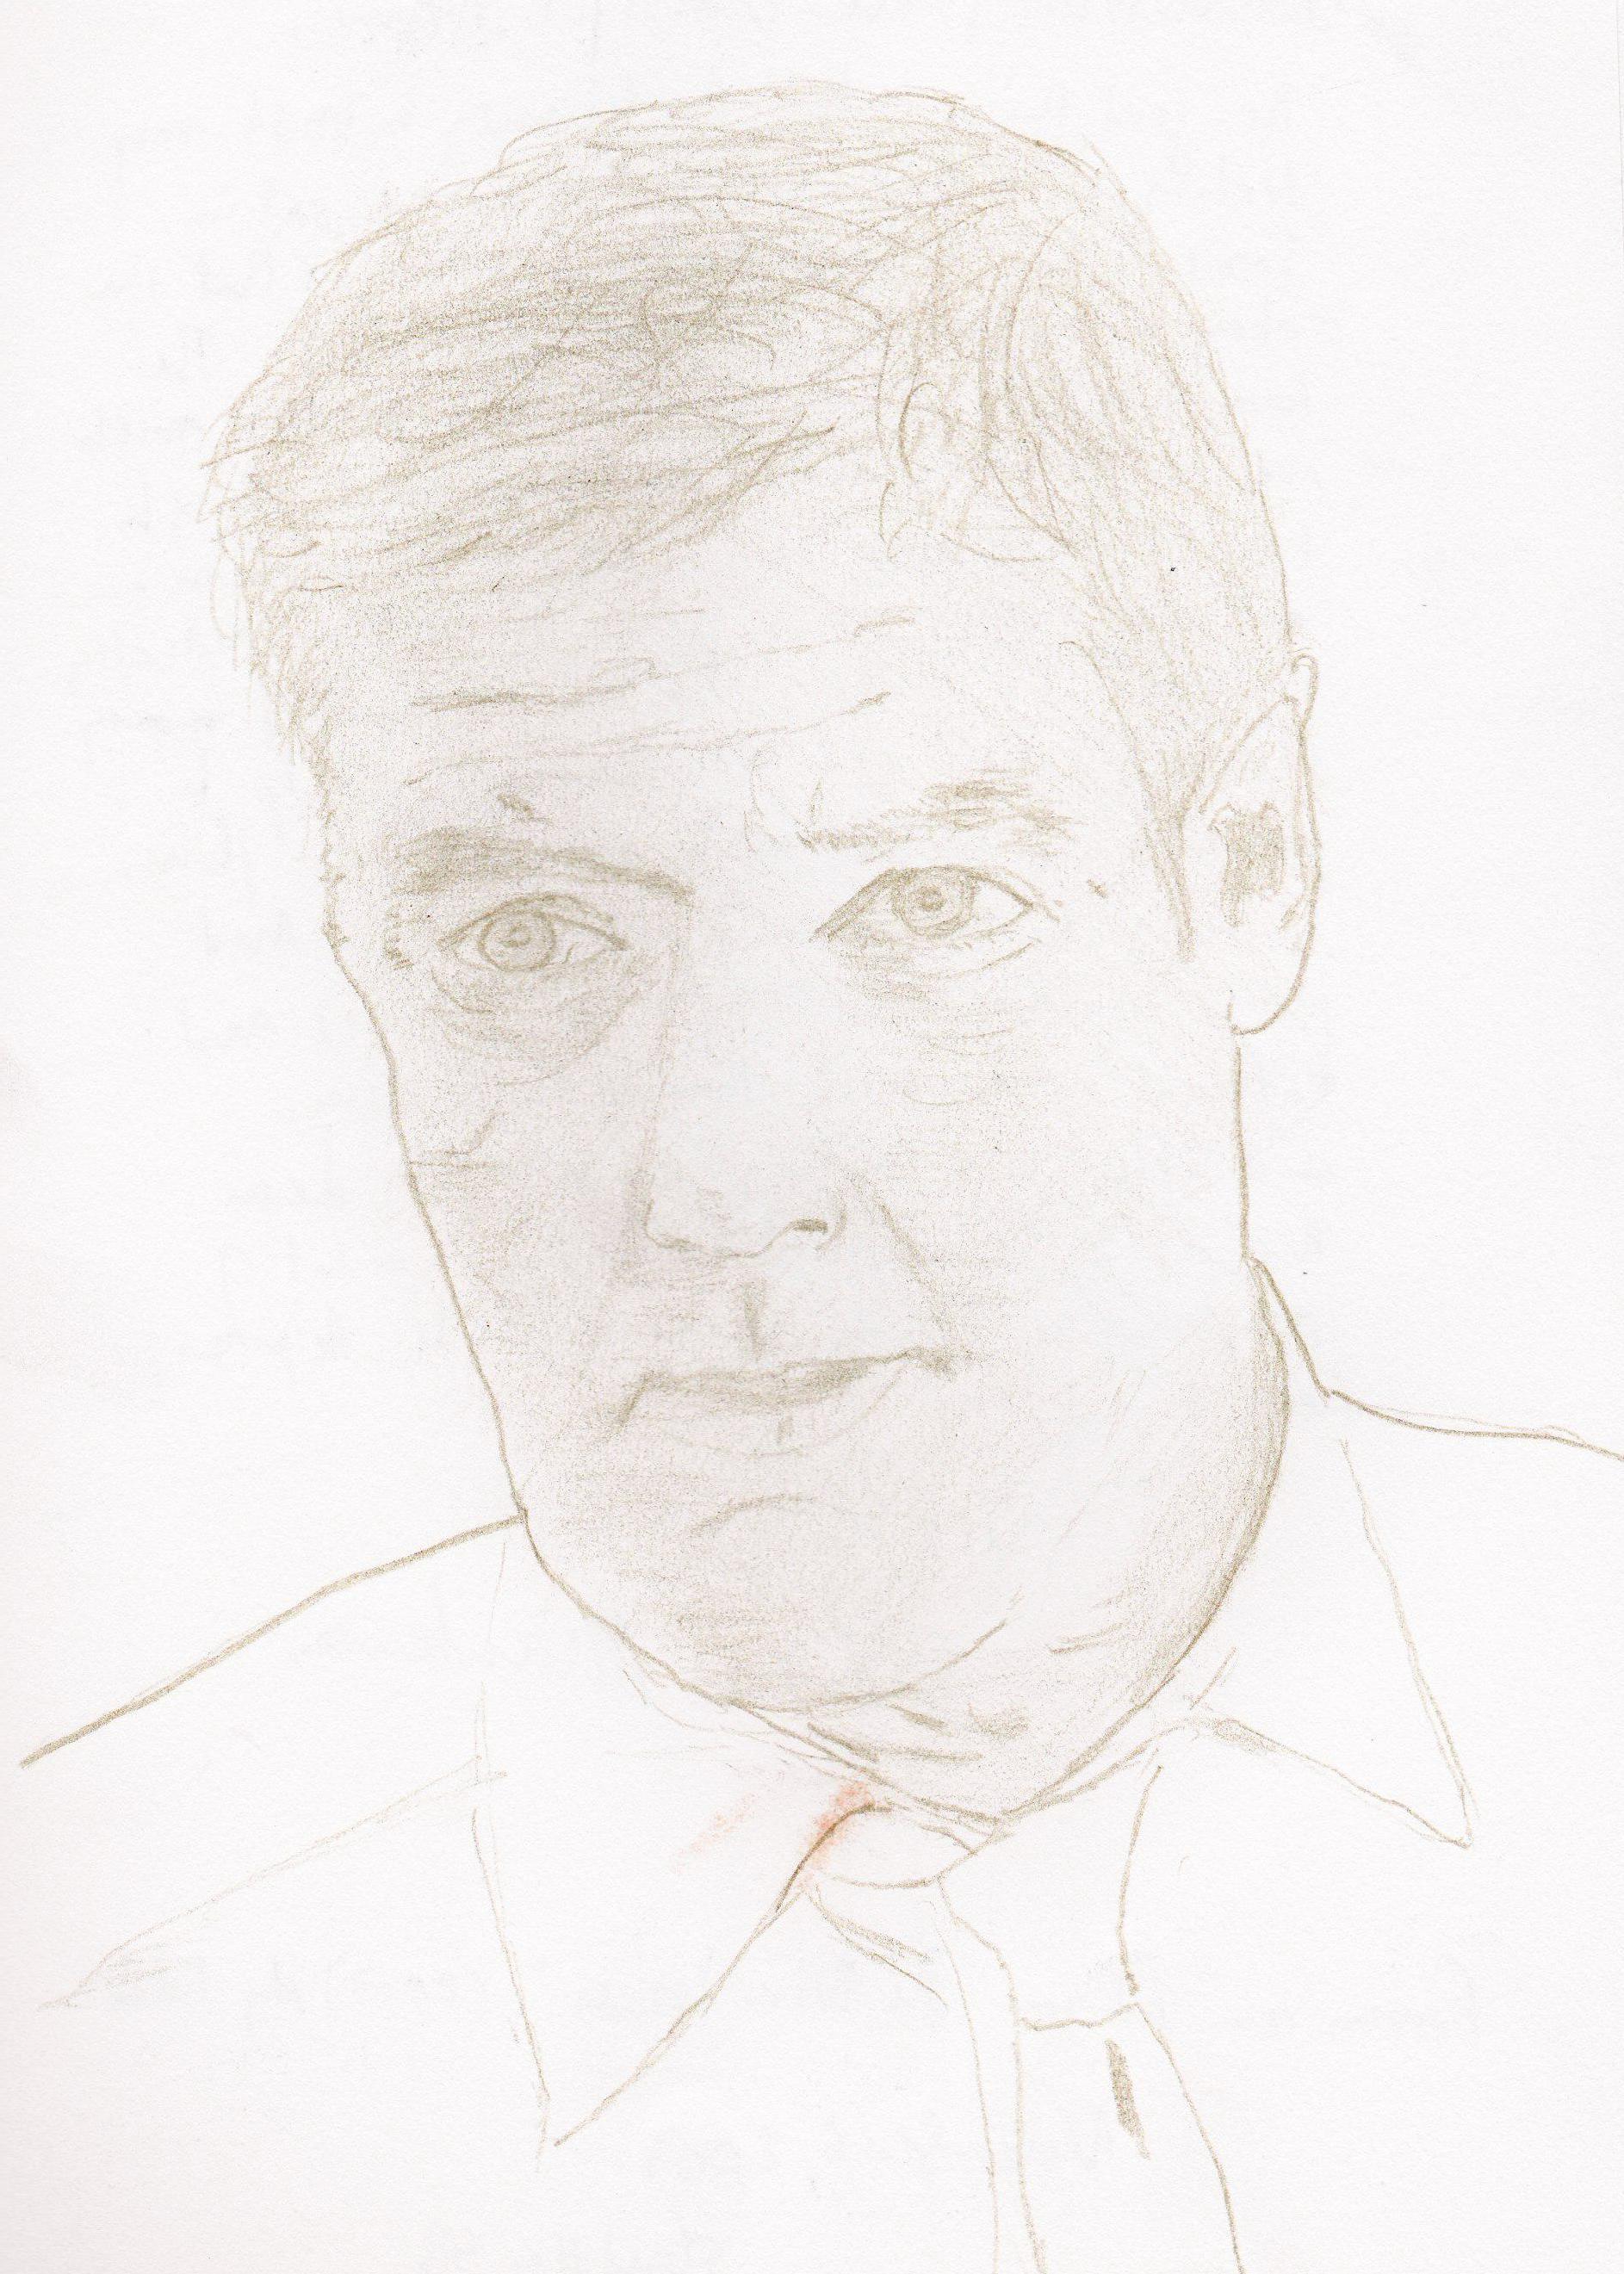 Celebrity 3 Clooney.jpg